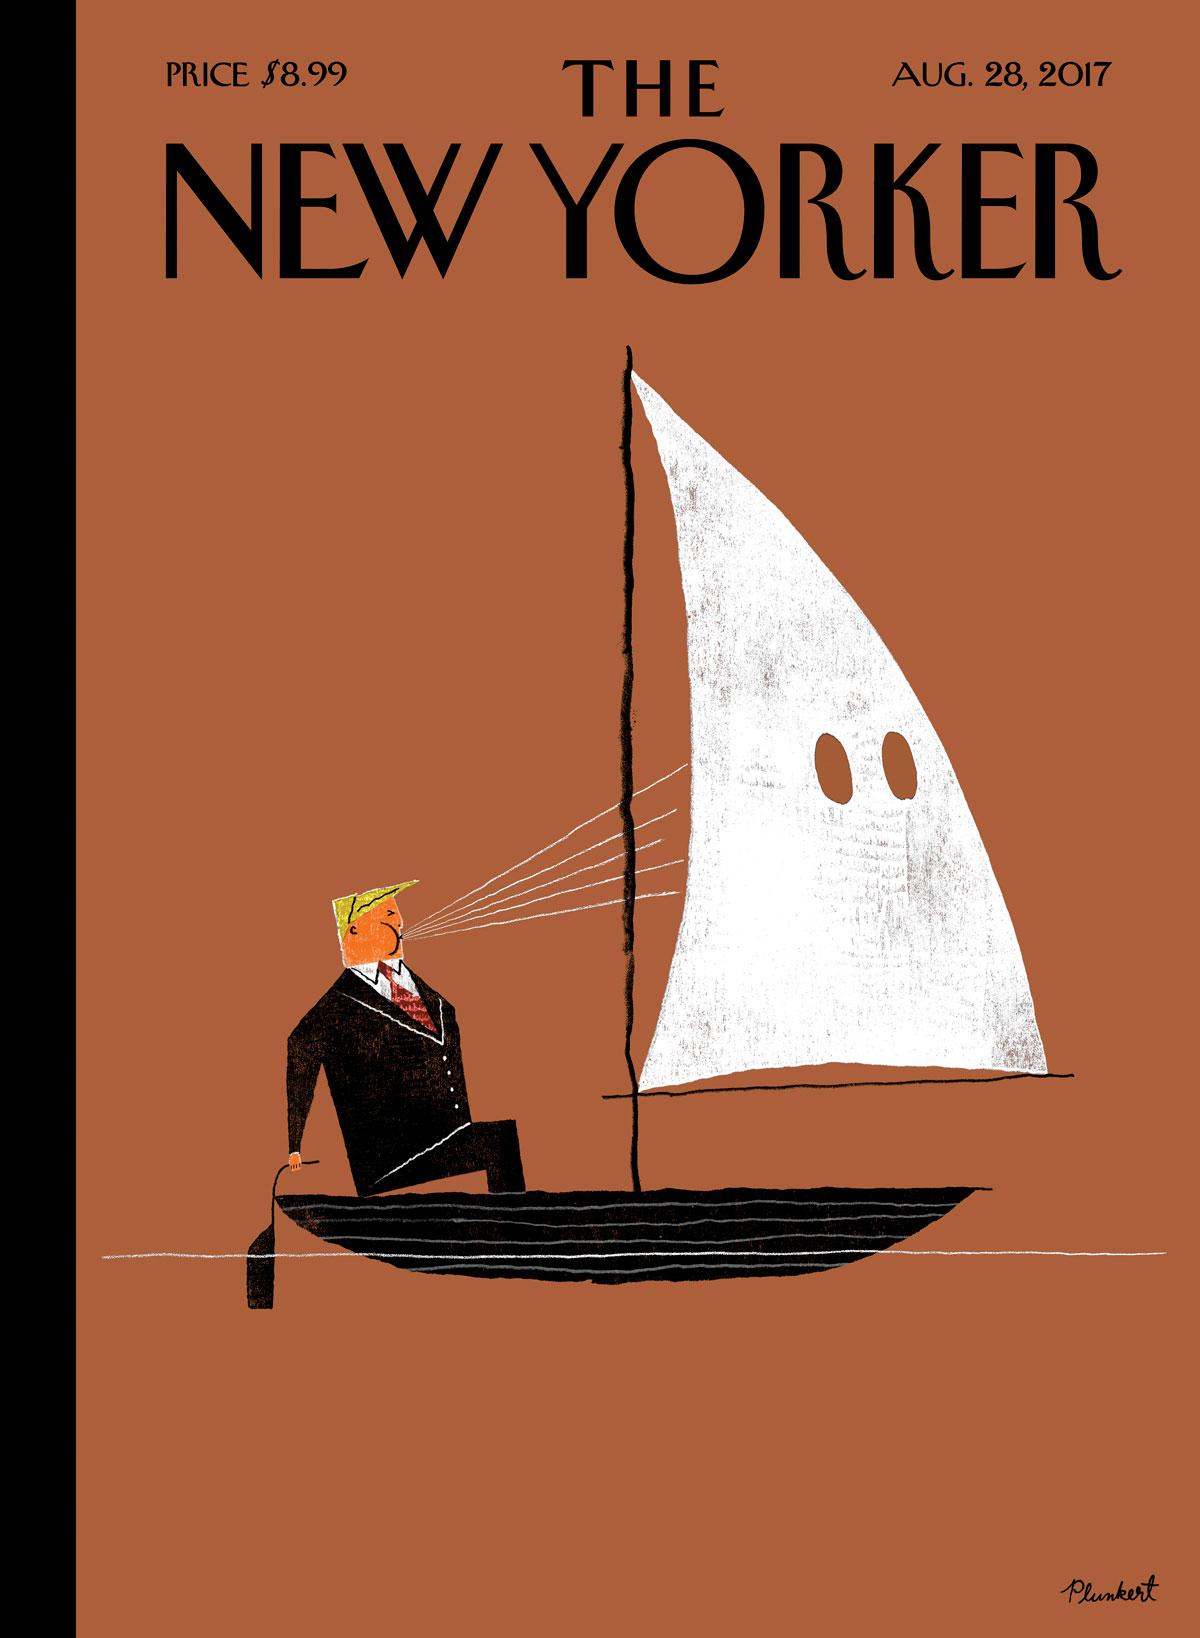 David Plunkert / Blowhard / The New Yorker MagazinePhil Disley / Michael Cohen / The Spectator